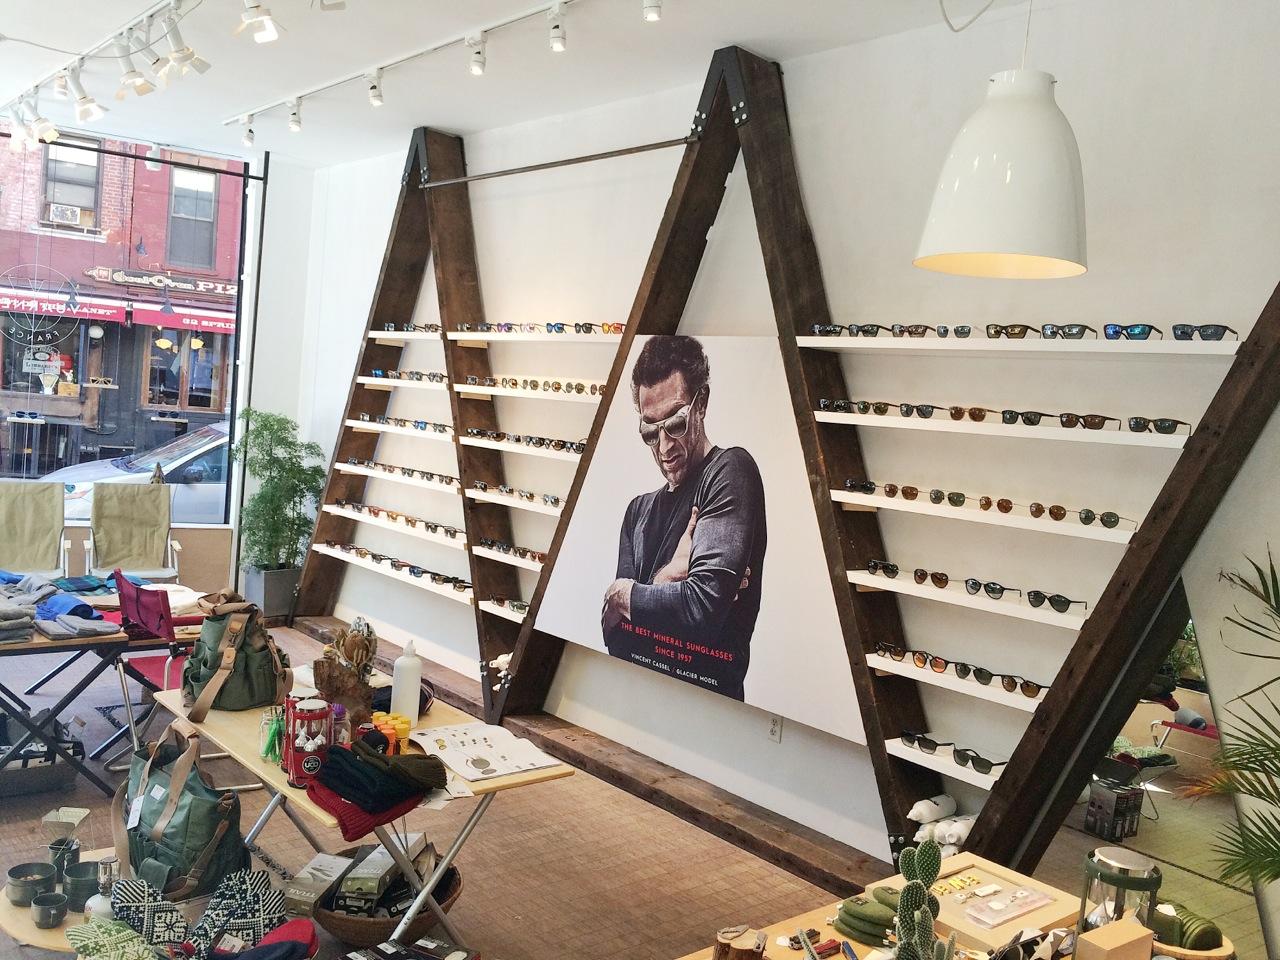 Vuarnet Opens First U.S. Pop Up Shop in New York